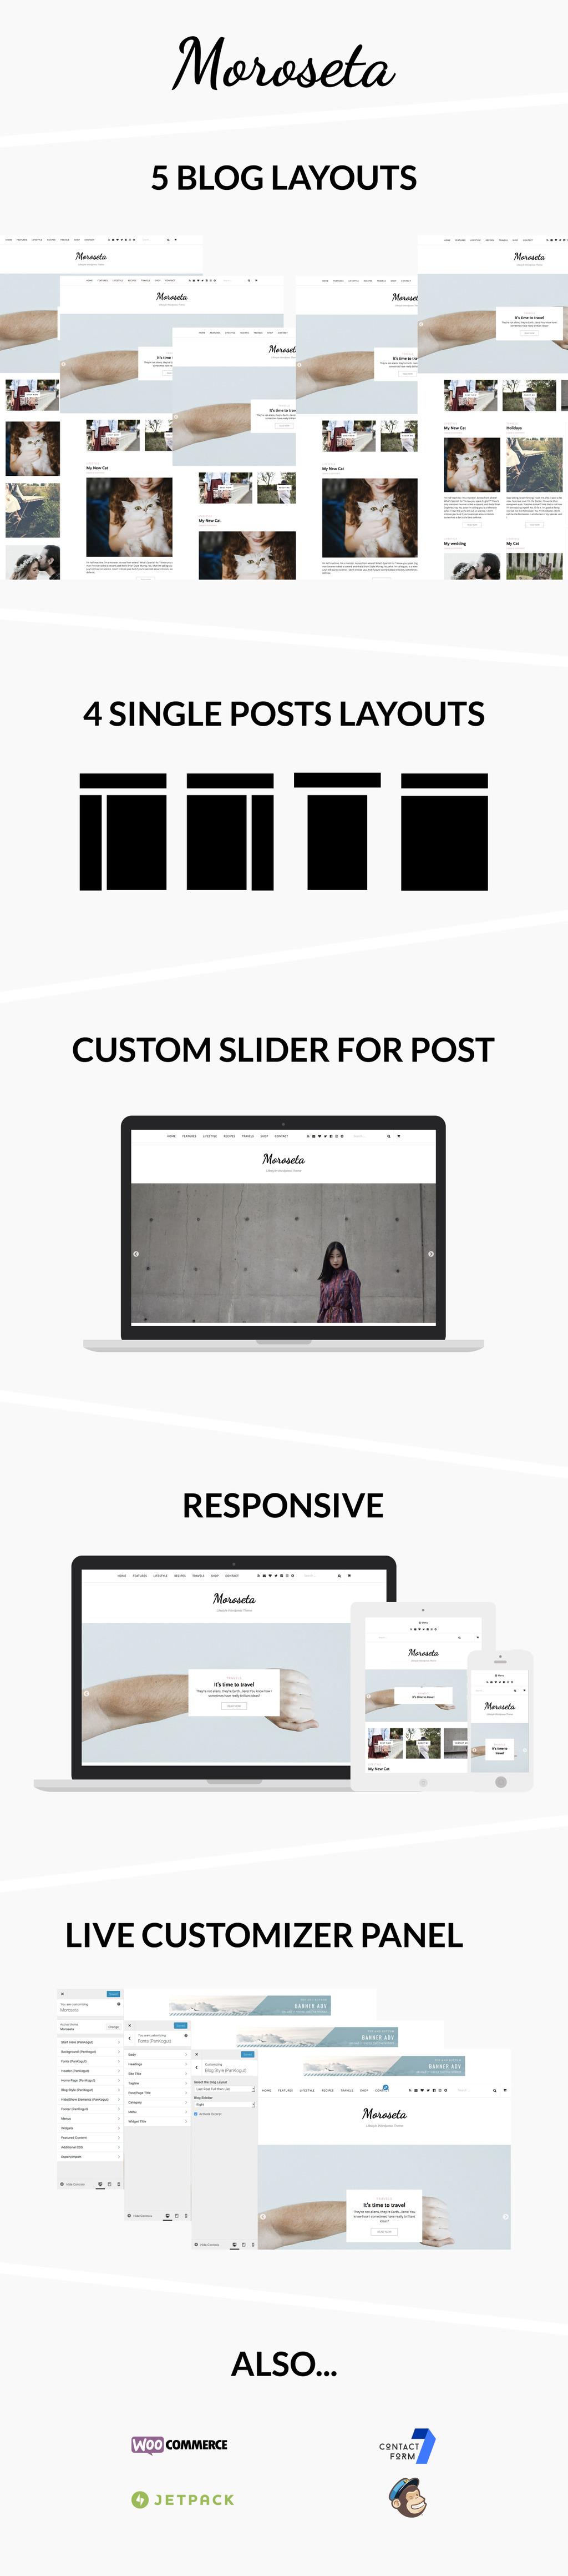 Moroseta WordPress Theme #64788